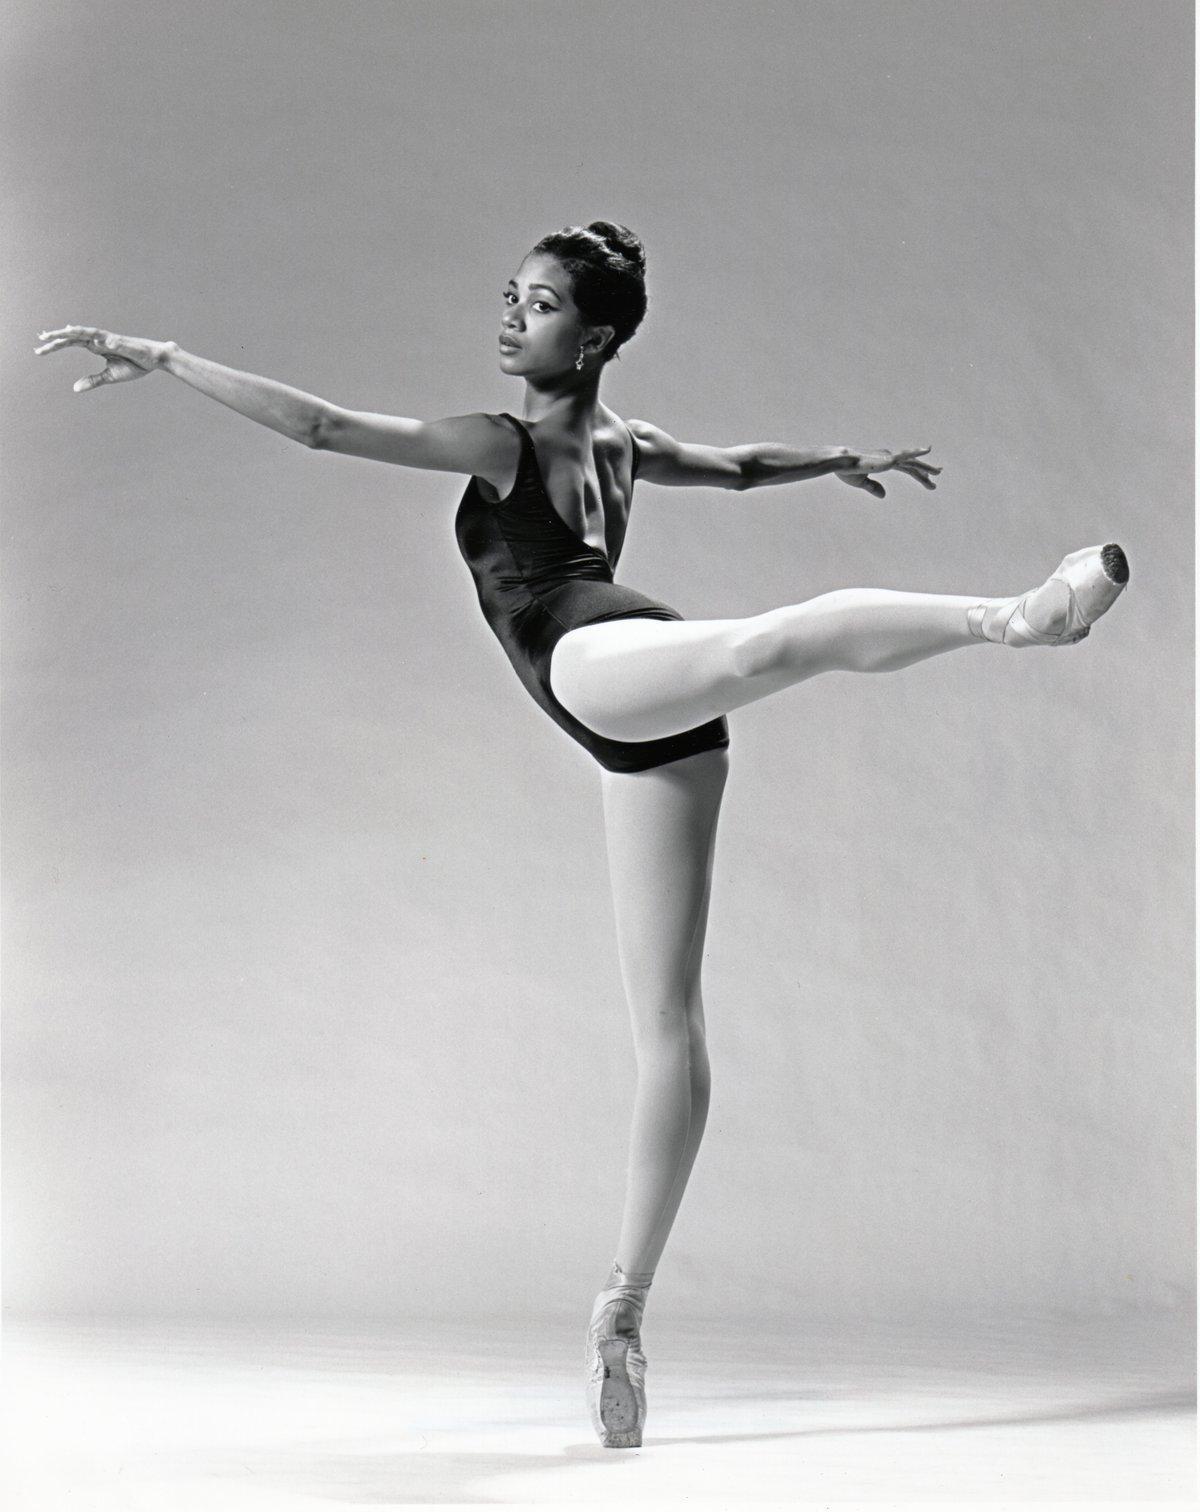 балерина юлтыева фото - 13